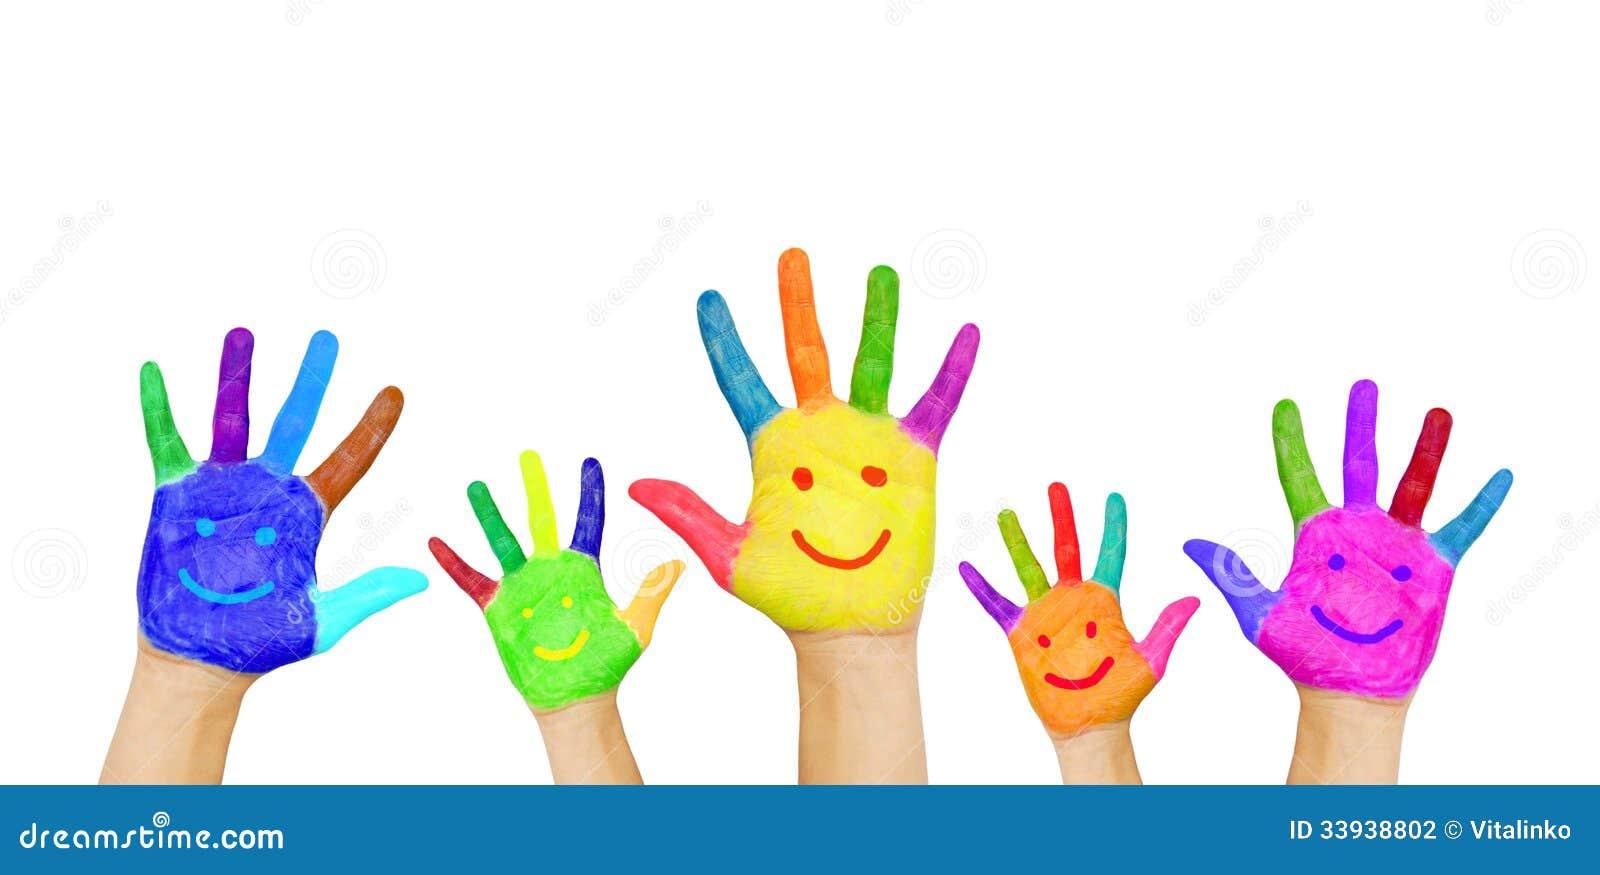 Painting Hands With Pre School Children